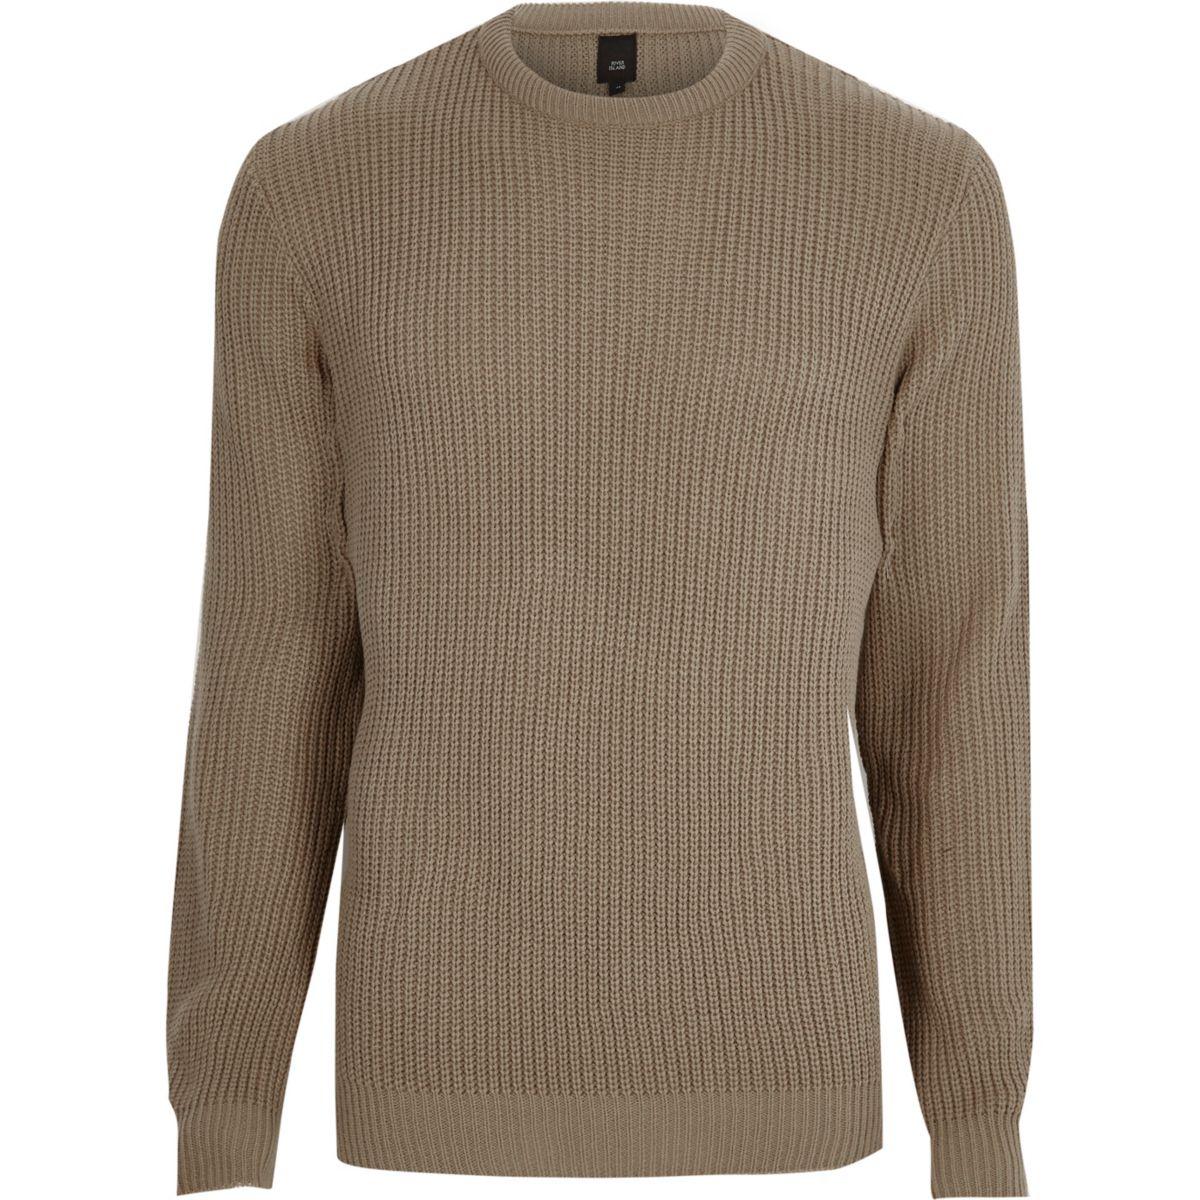 Camel crew neck fisherman sweater